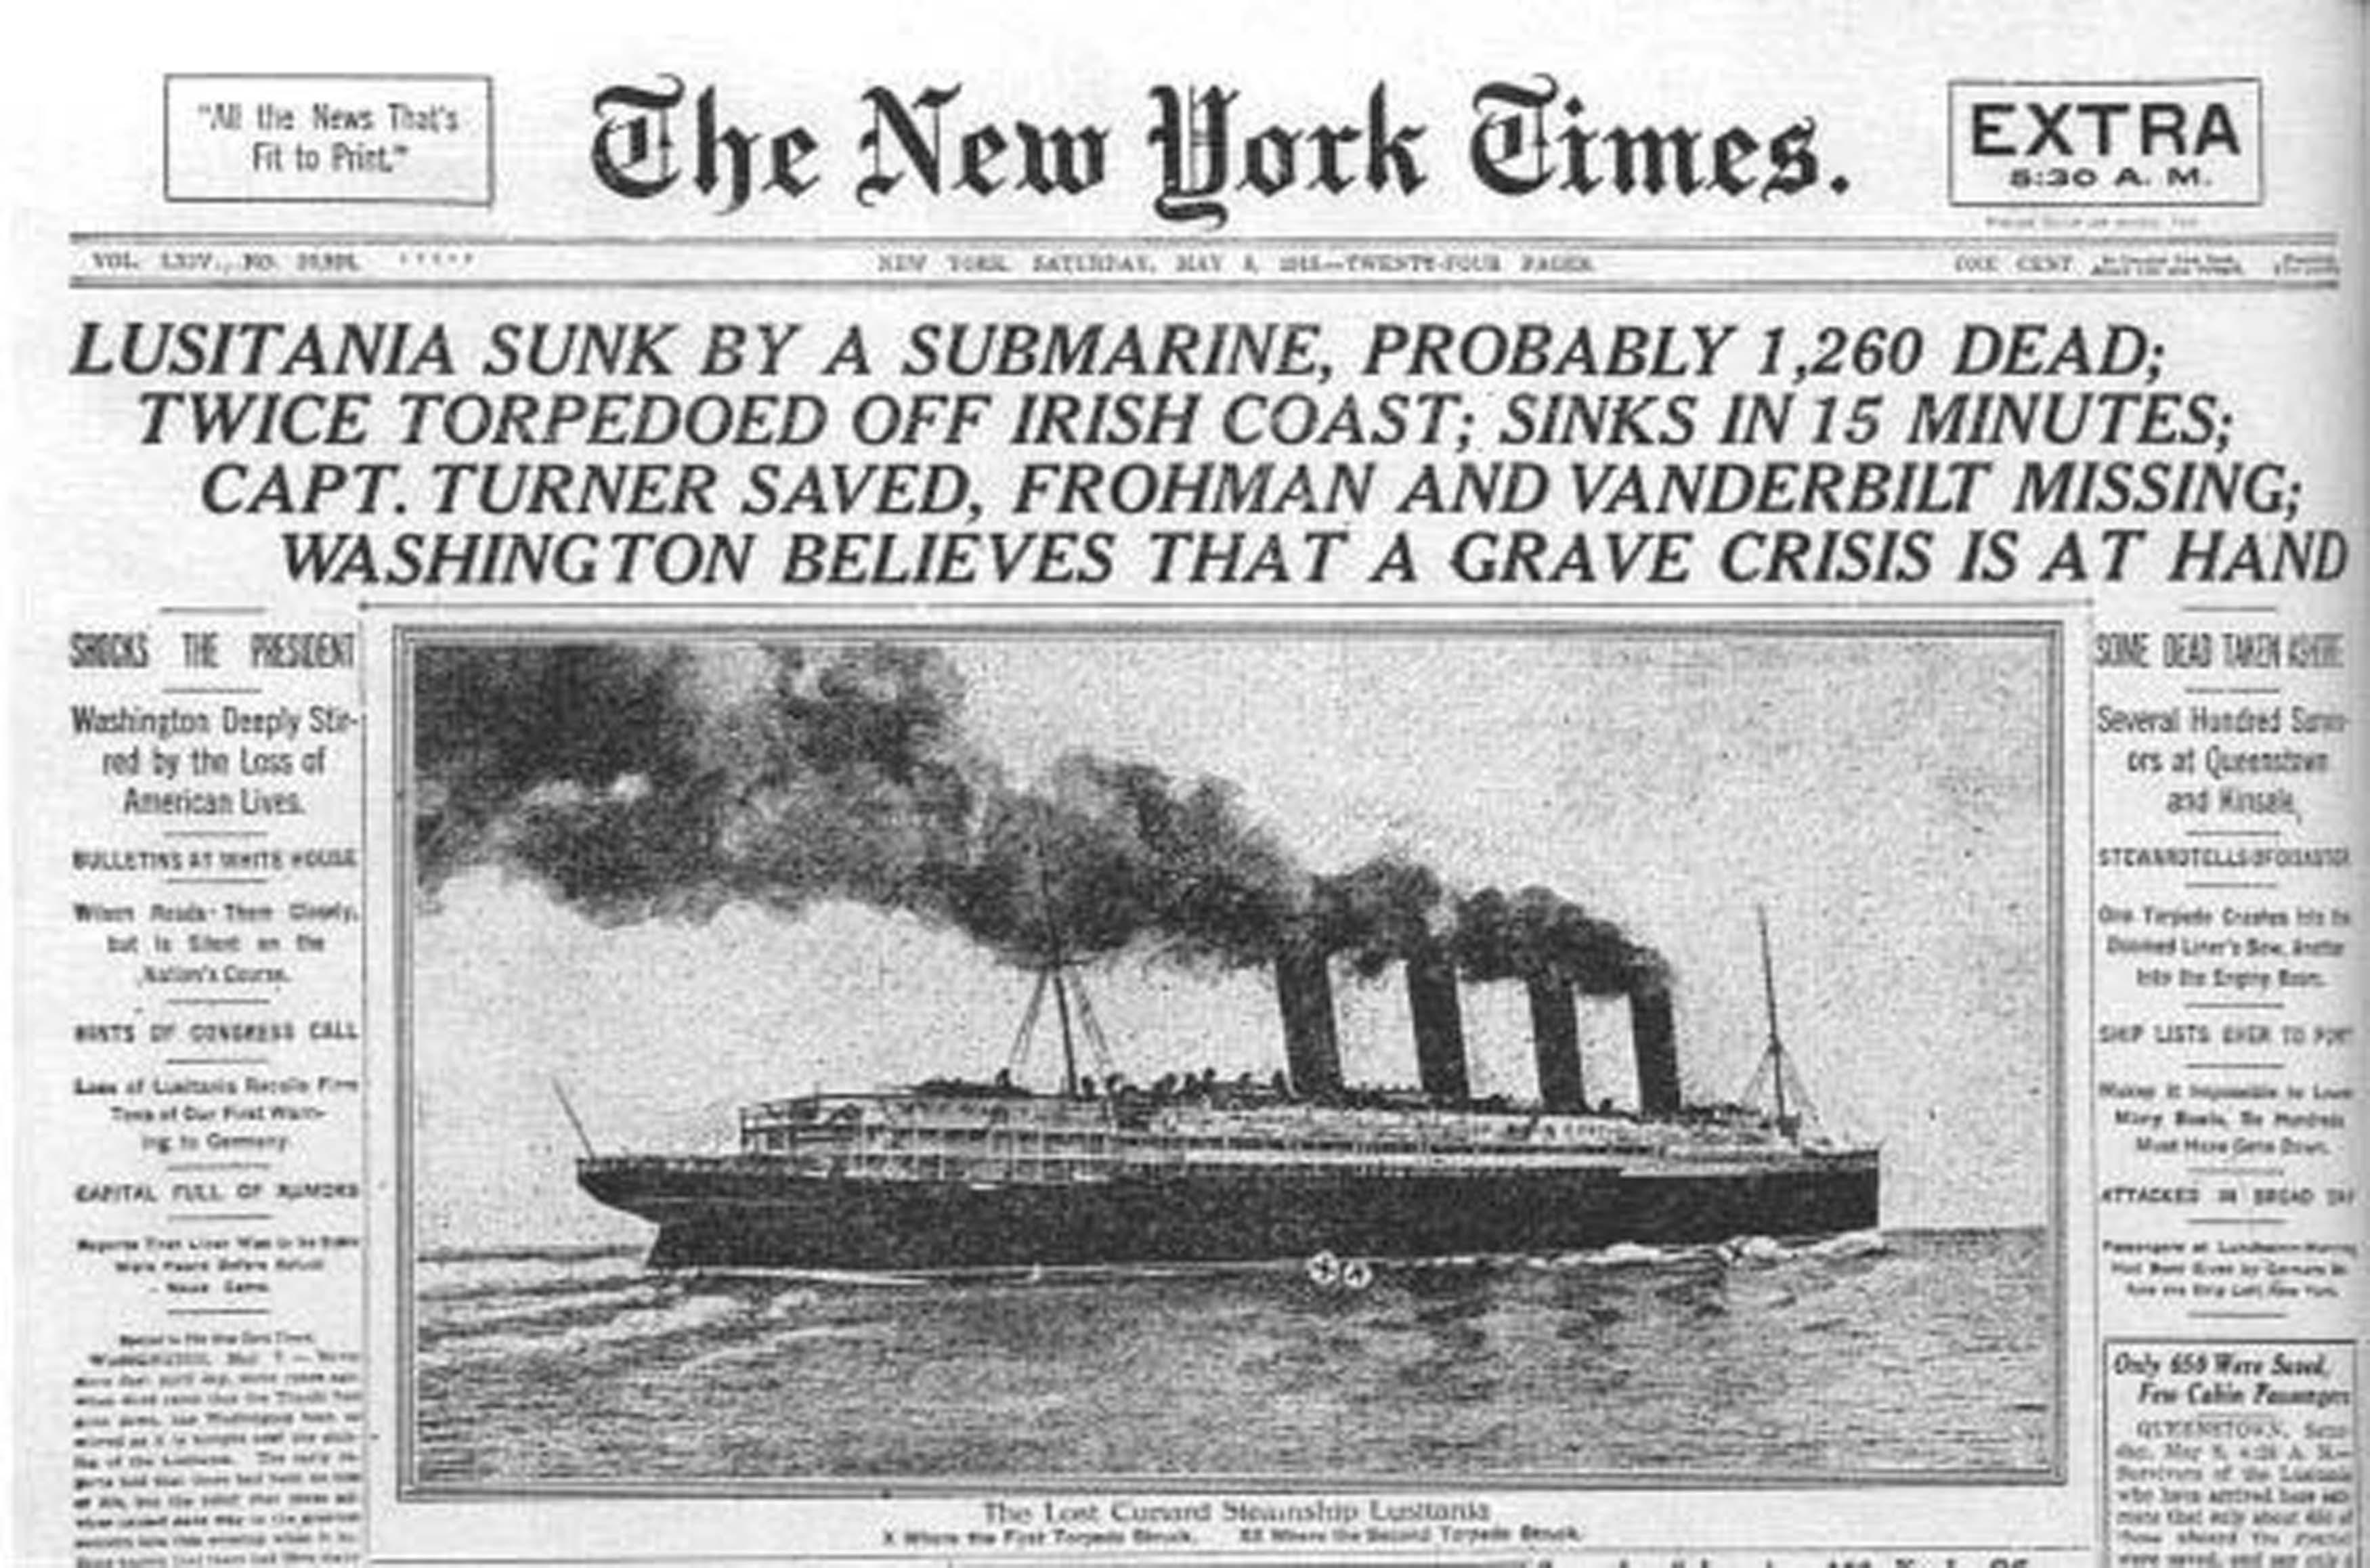 Lusitania New York Times Newspaper